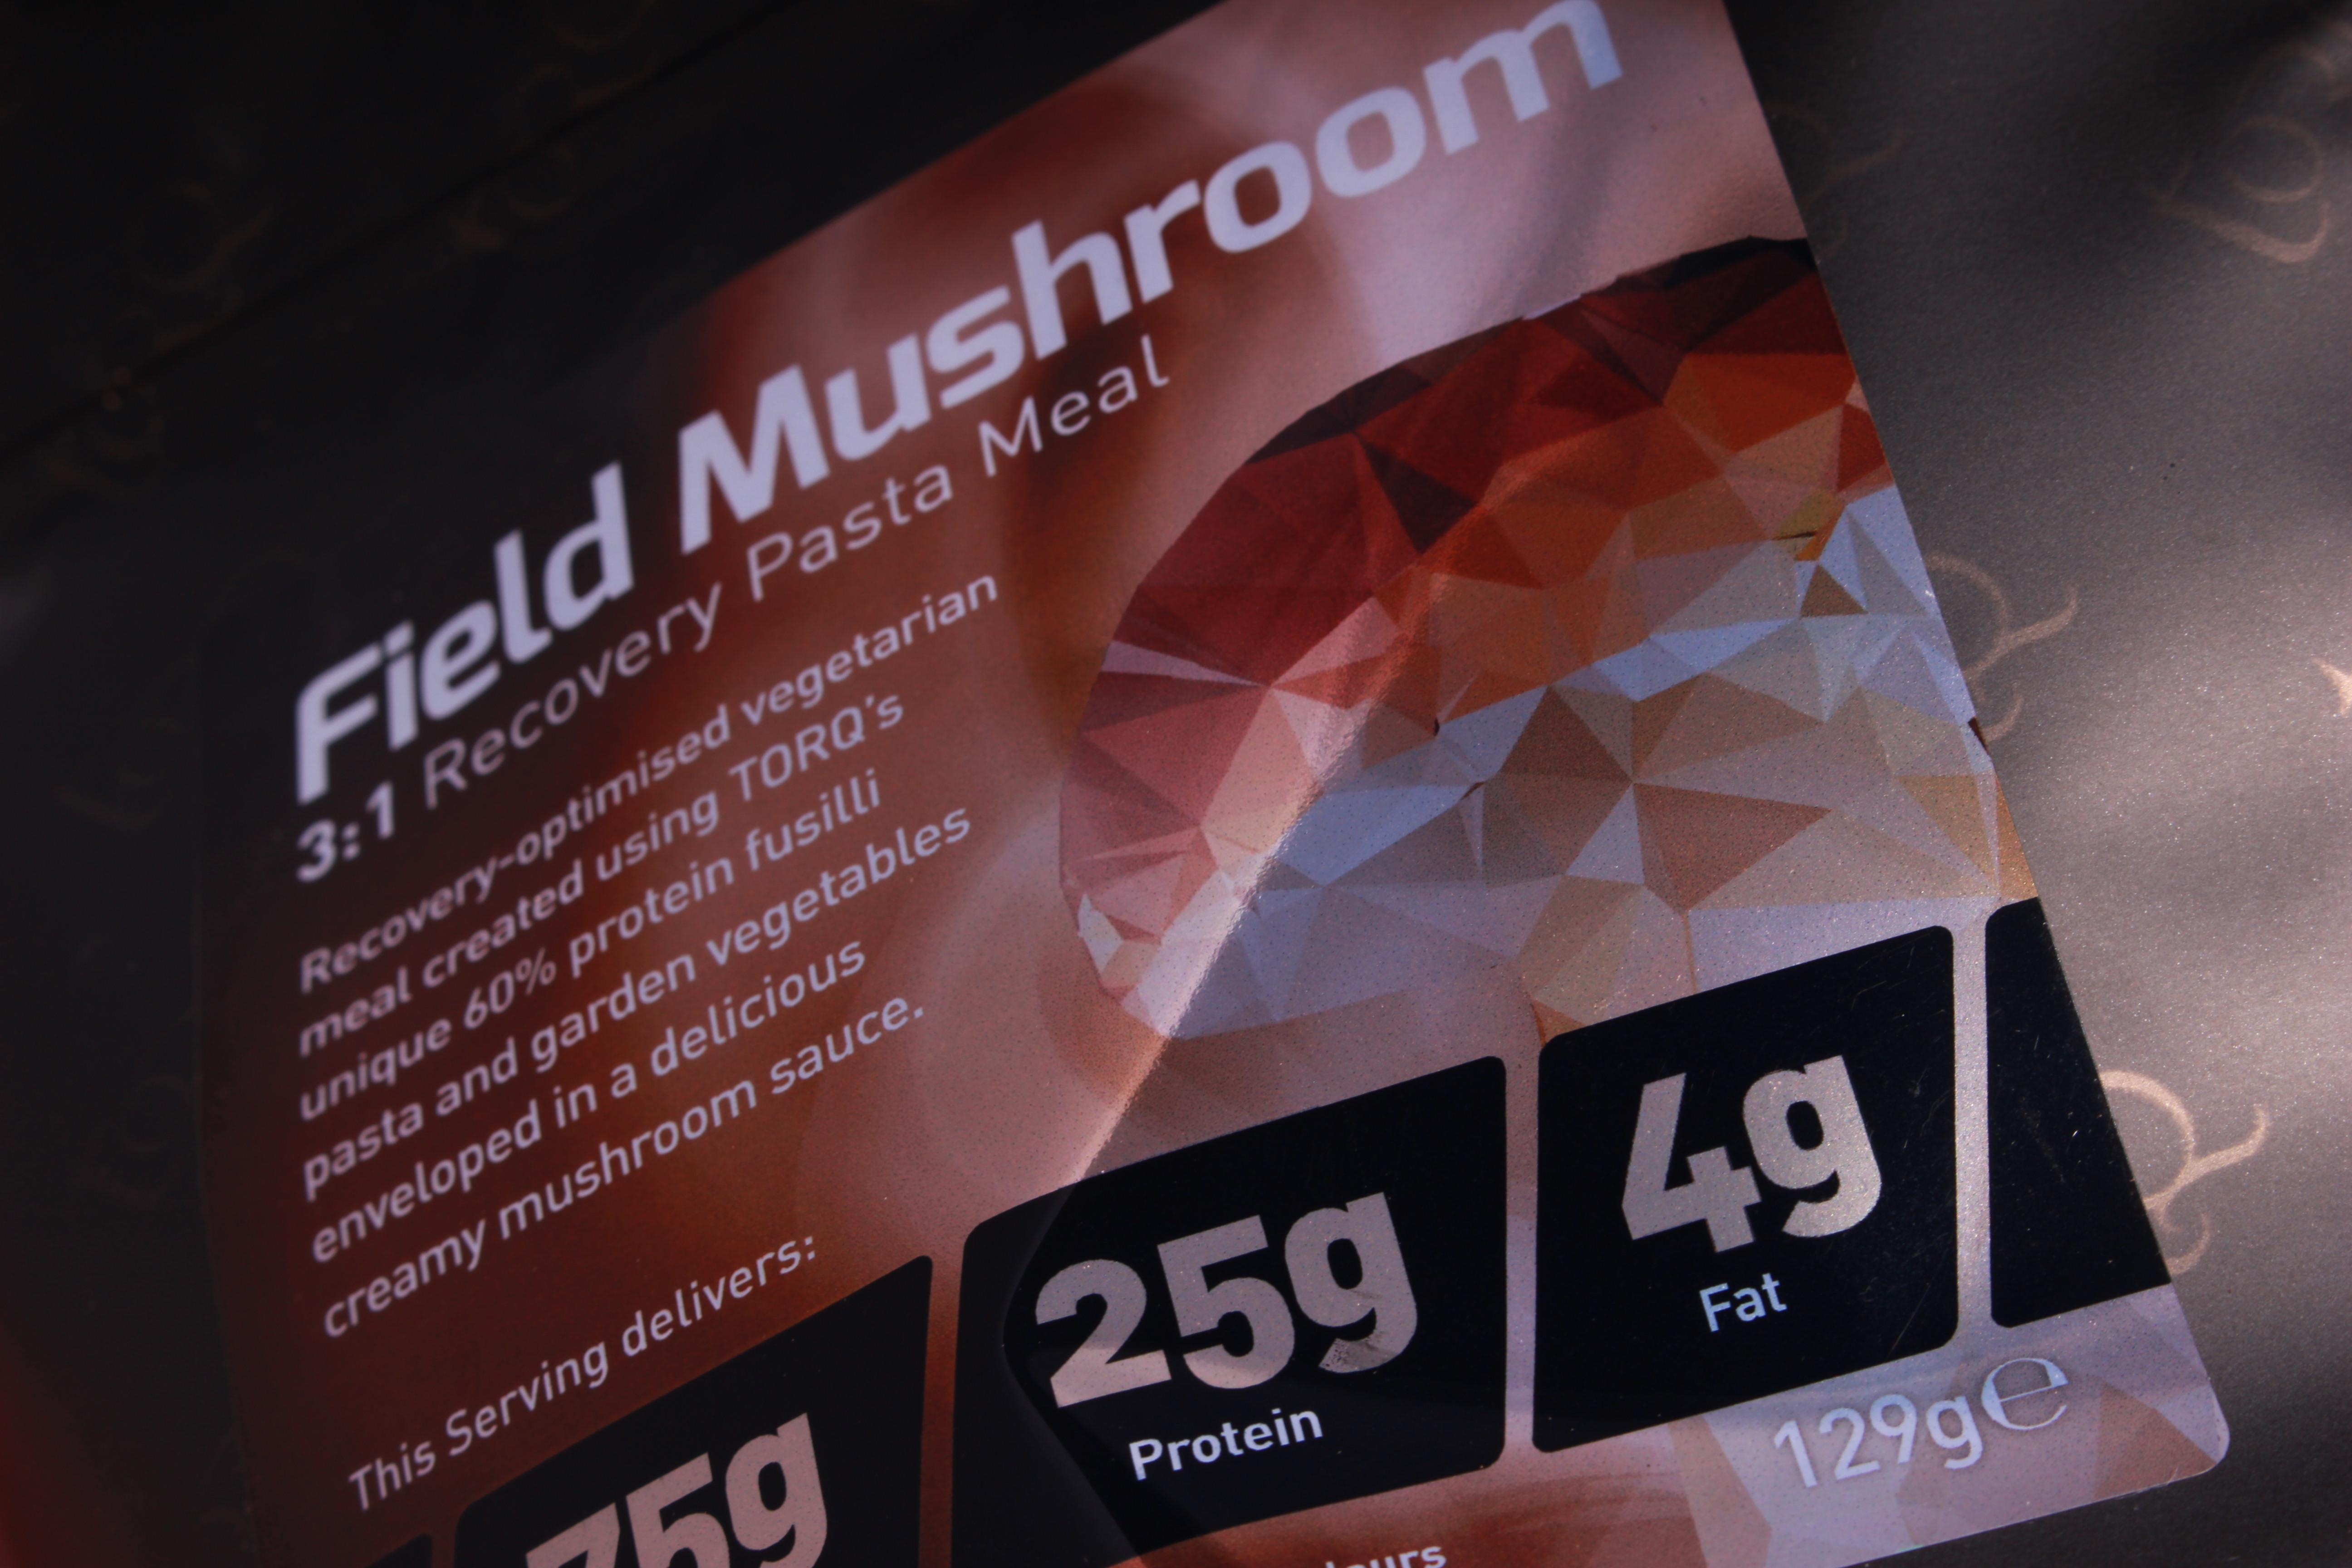 Field Mushroom 3:1 Label